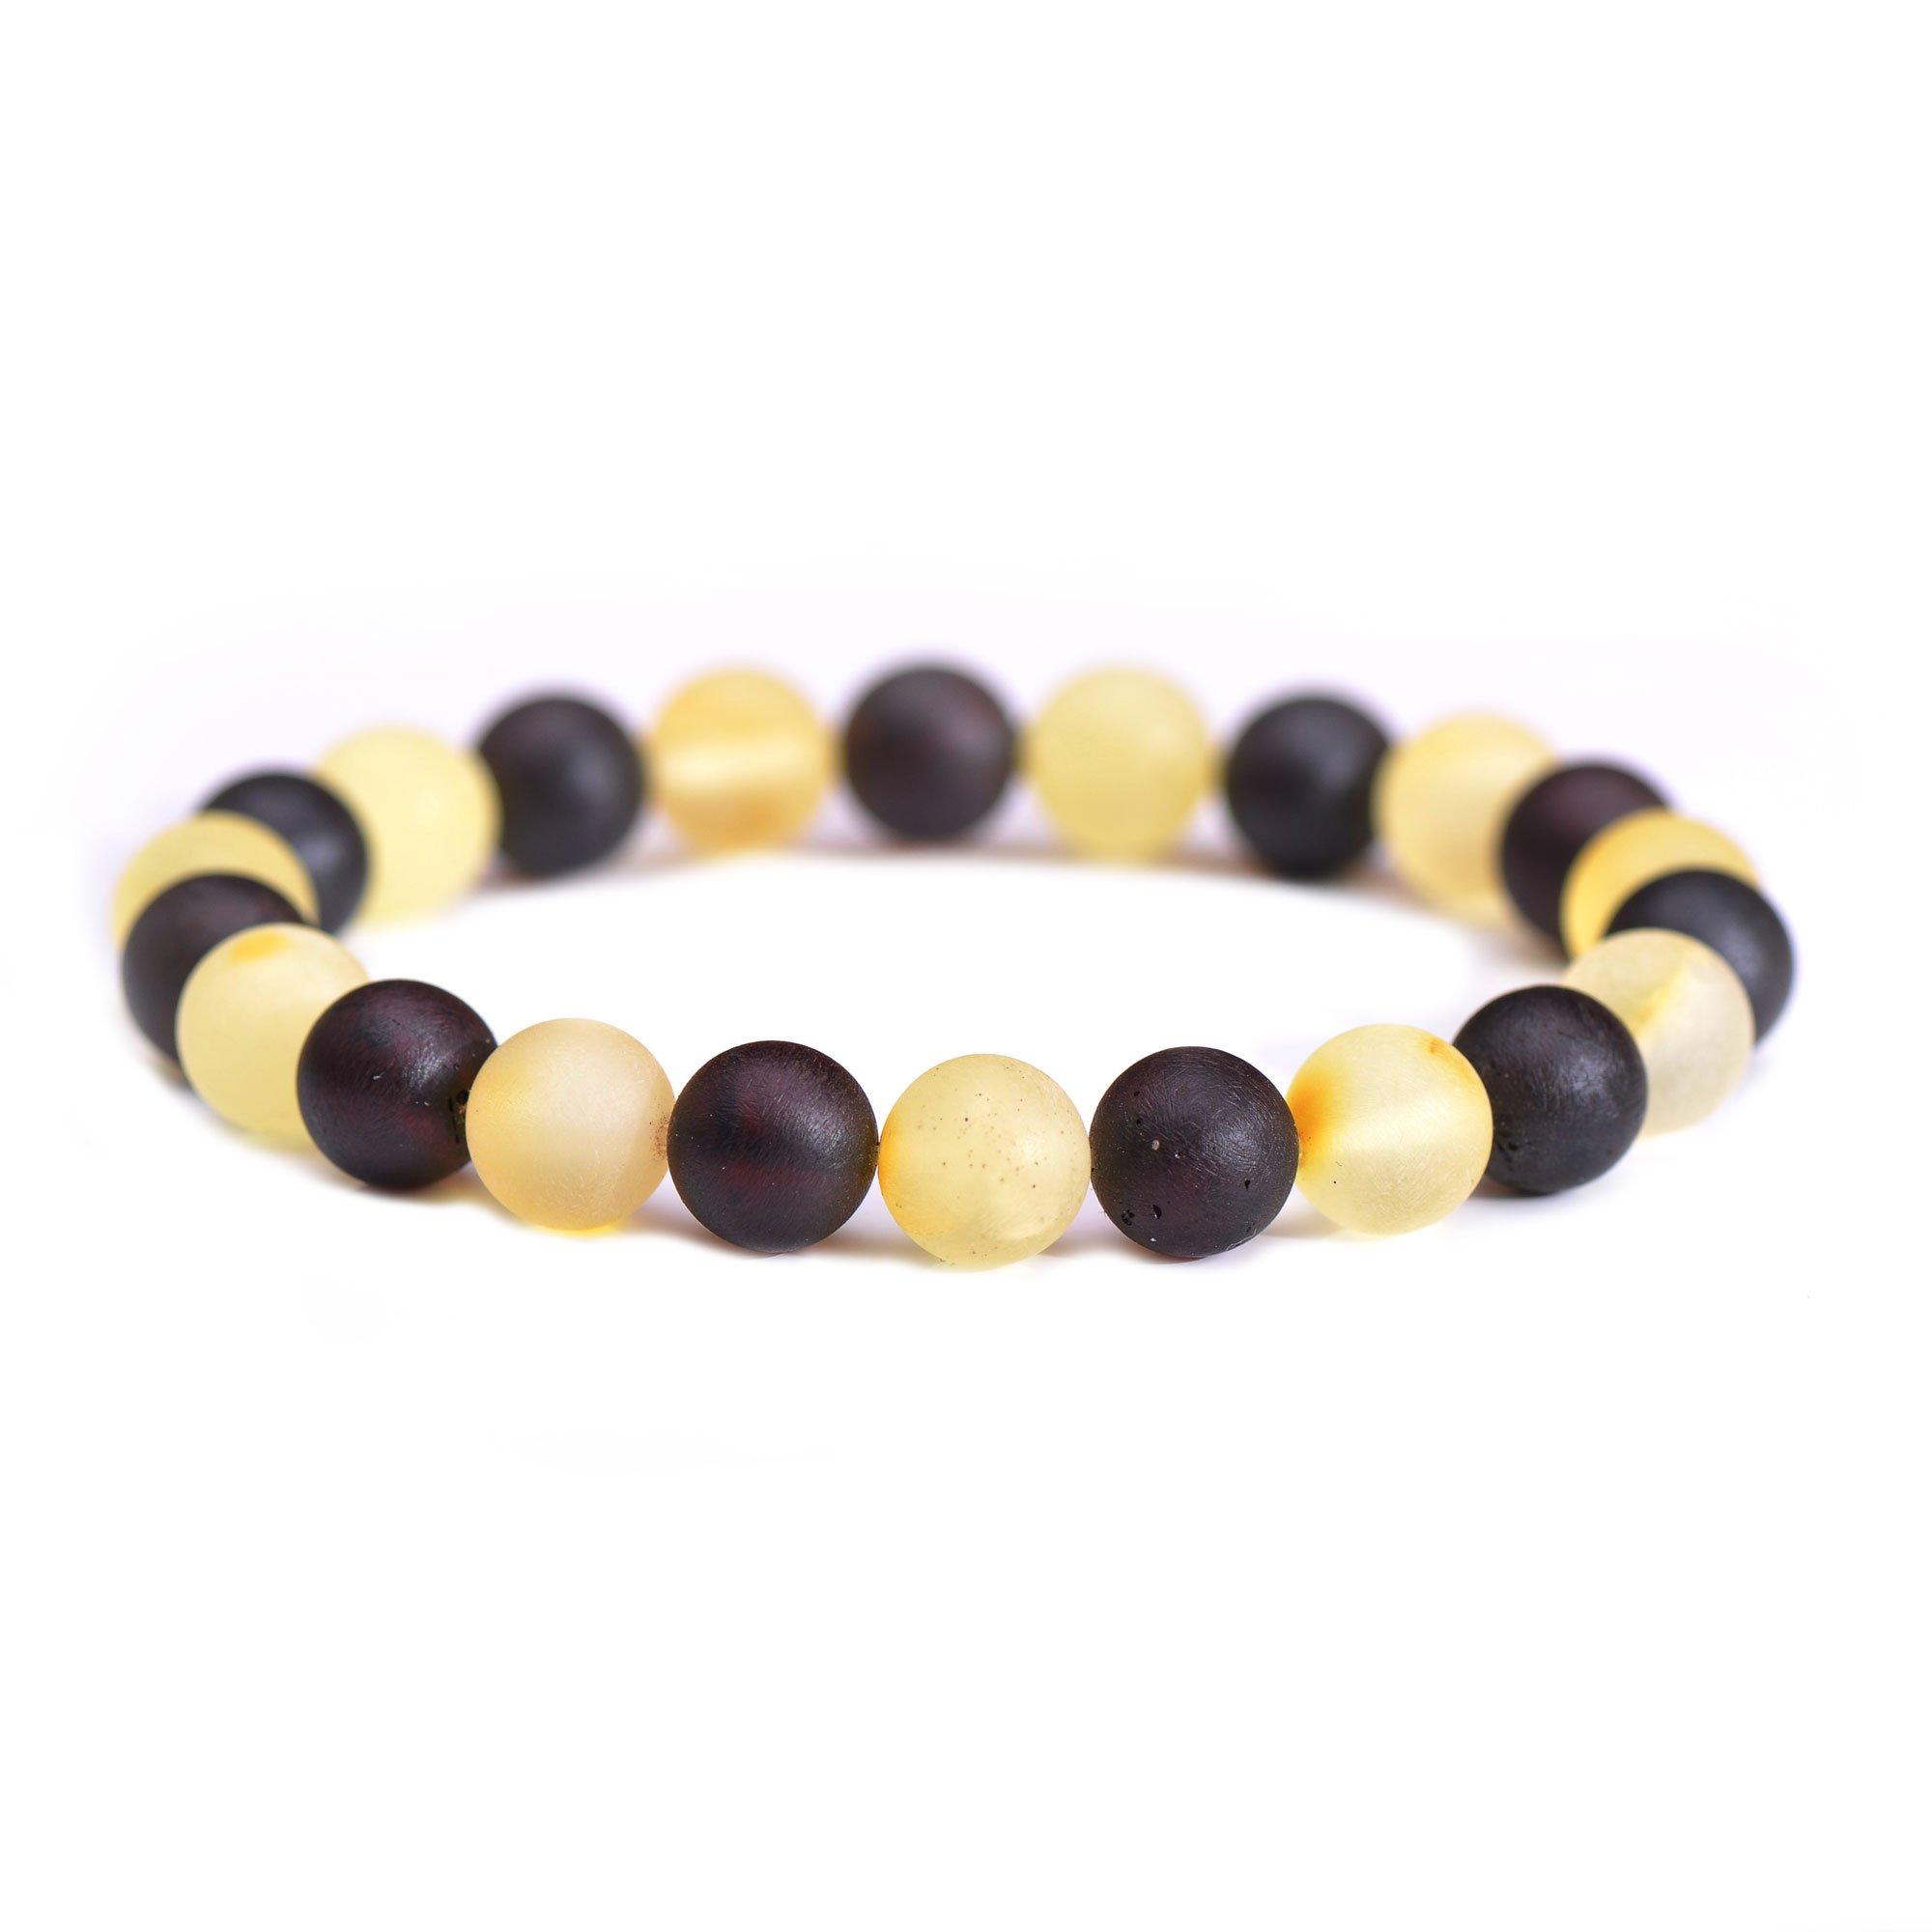 Raw Amber Bracelet for Woman Round Beads - Amber Bracelet for Men - Round Beads Amber Bracelet - Certified Handmade Baltic Amber Bracelet